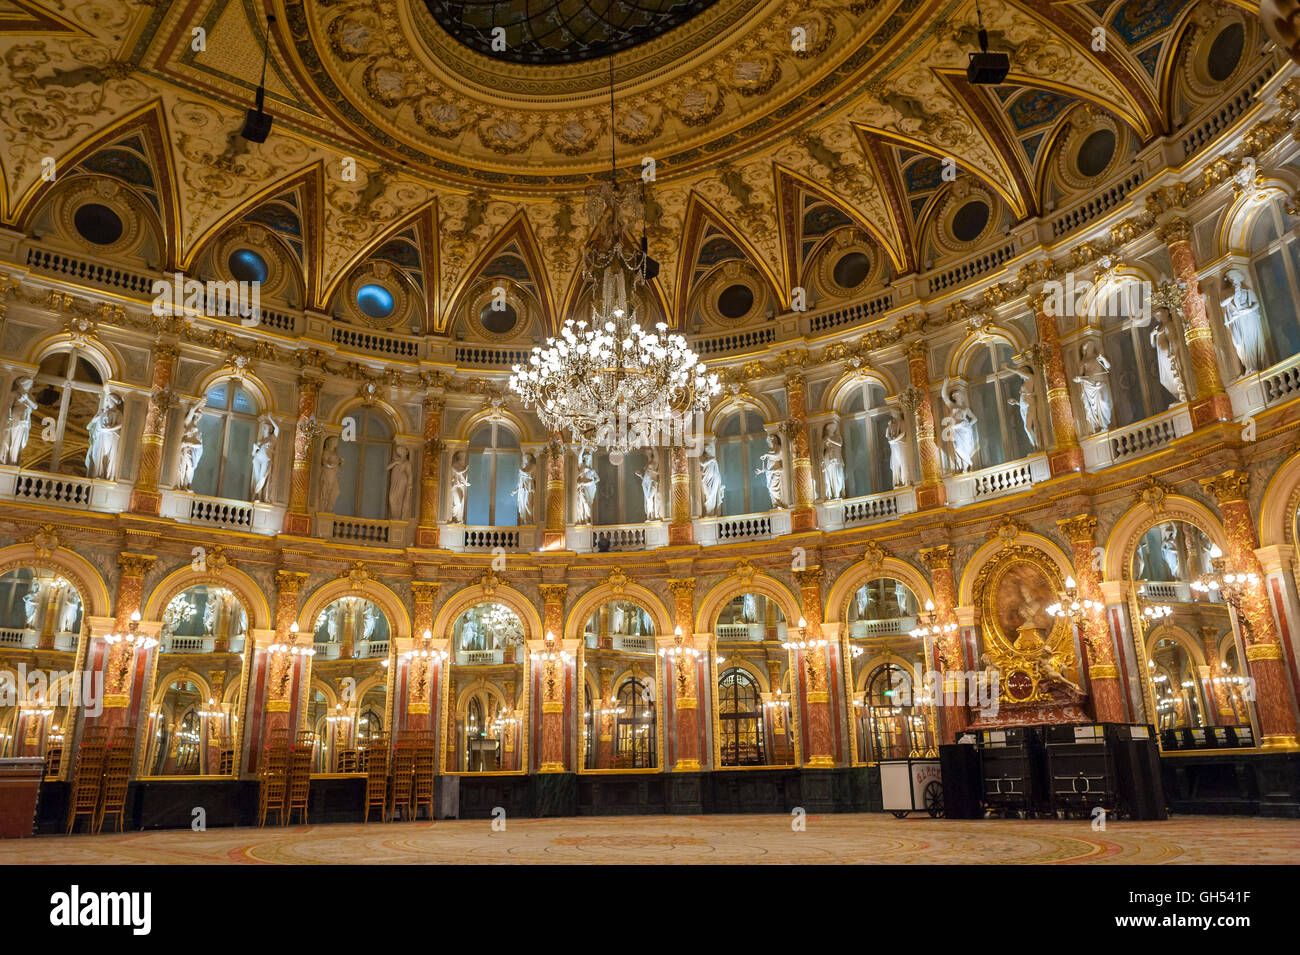 Le Grand Hotel Opera Paris